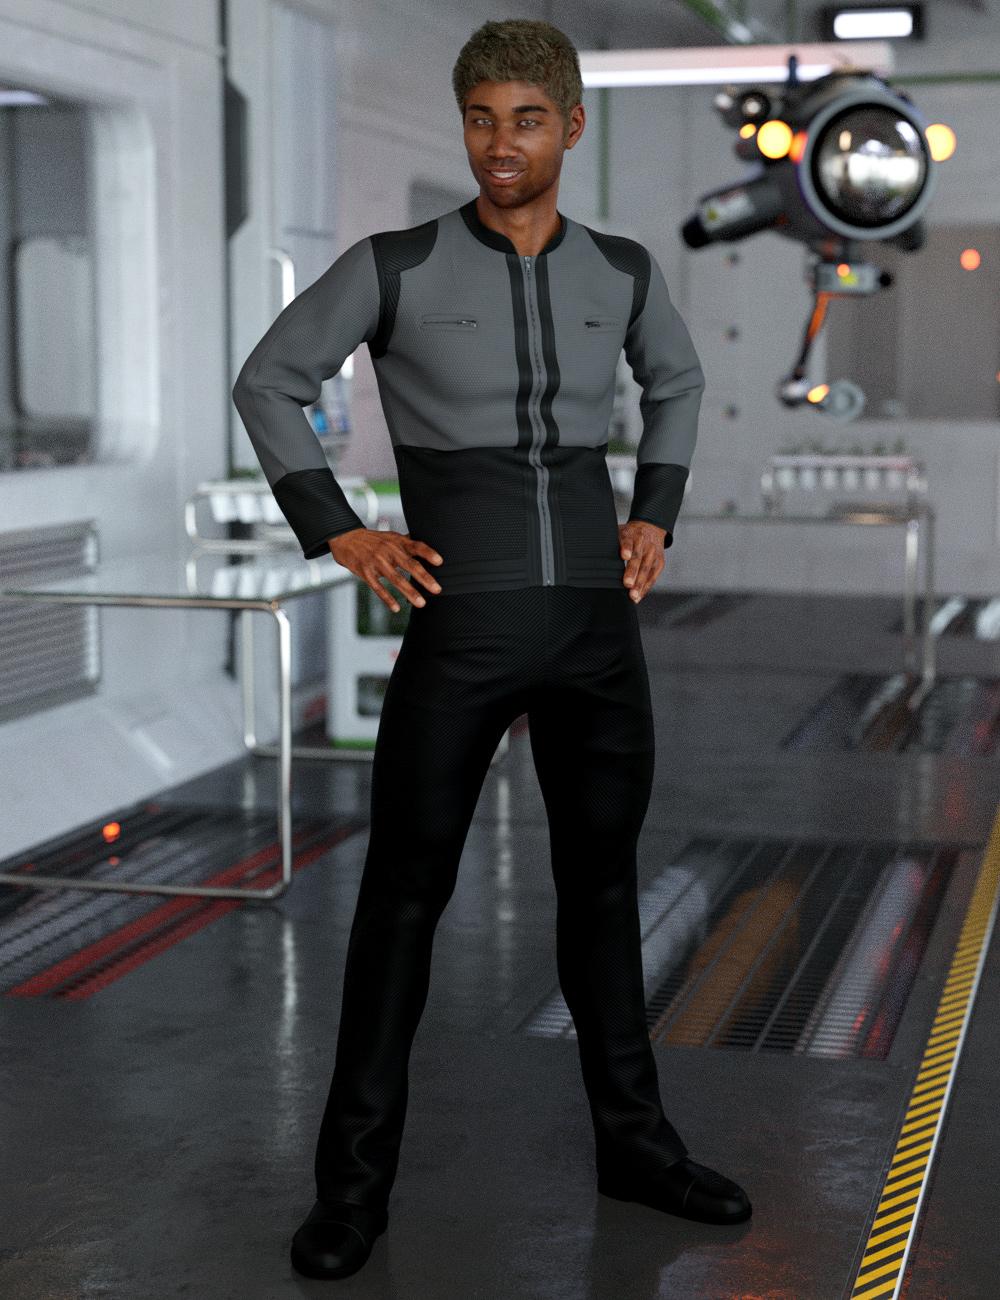 dForce Bridge Officer Outfit for Genesis 8 Male(s) by: NikisatezDestinysGarden, 3D Models by Daz 3D